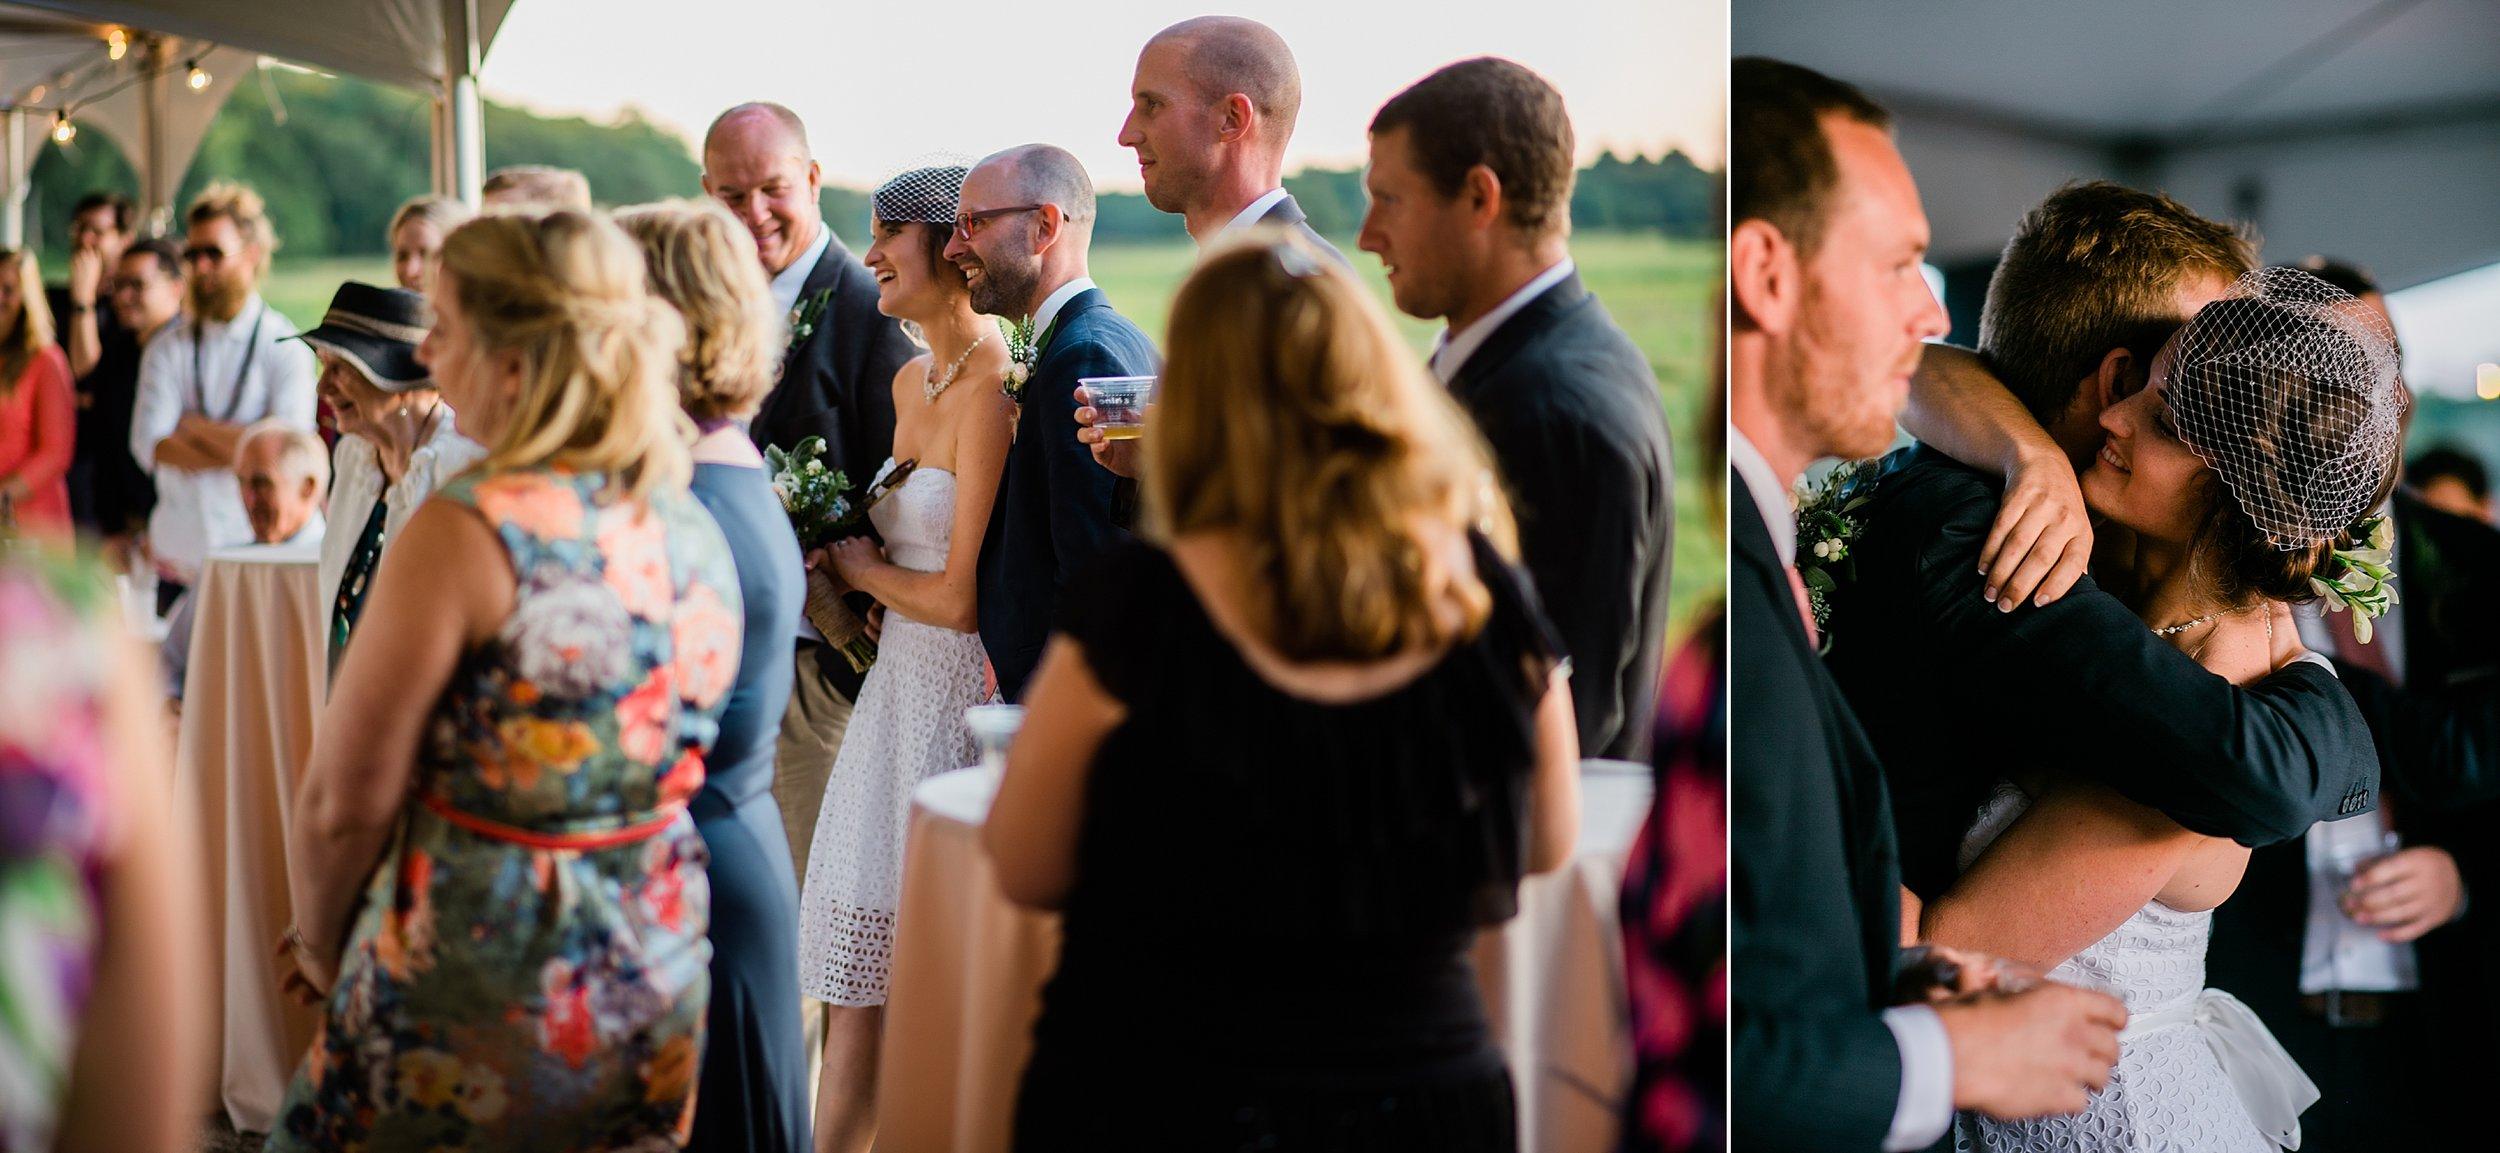 084 los angeles wedding photographer.jpg